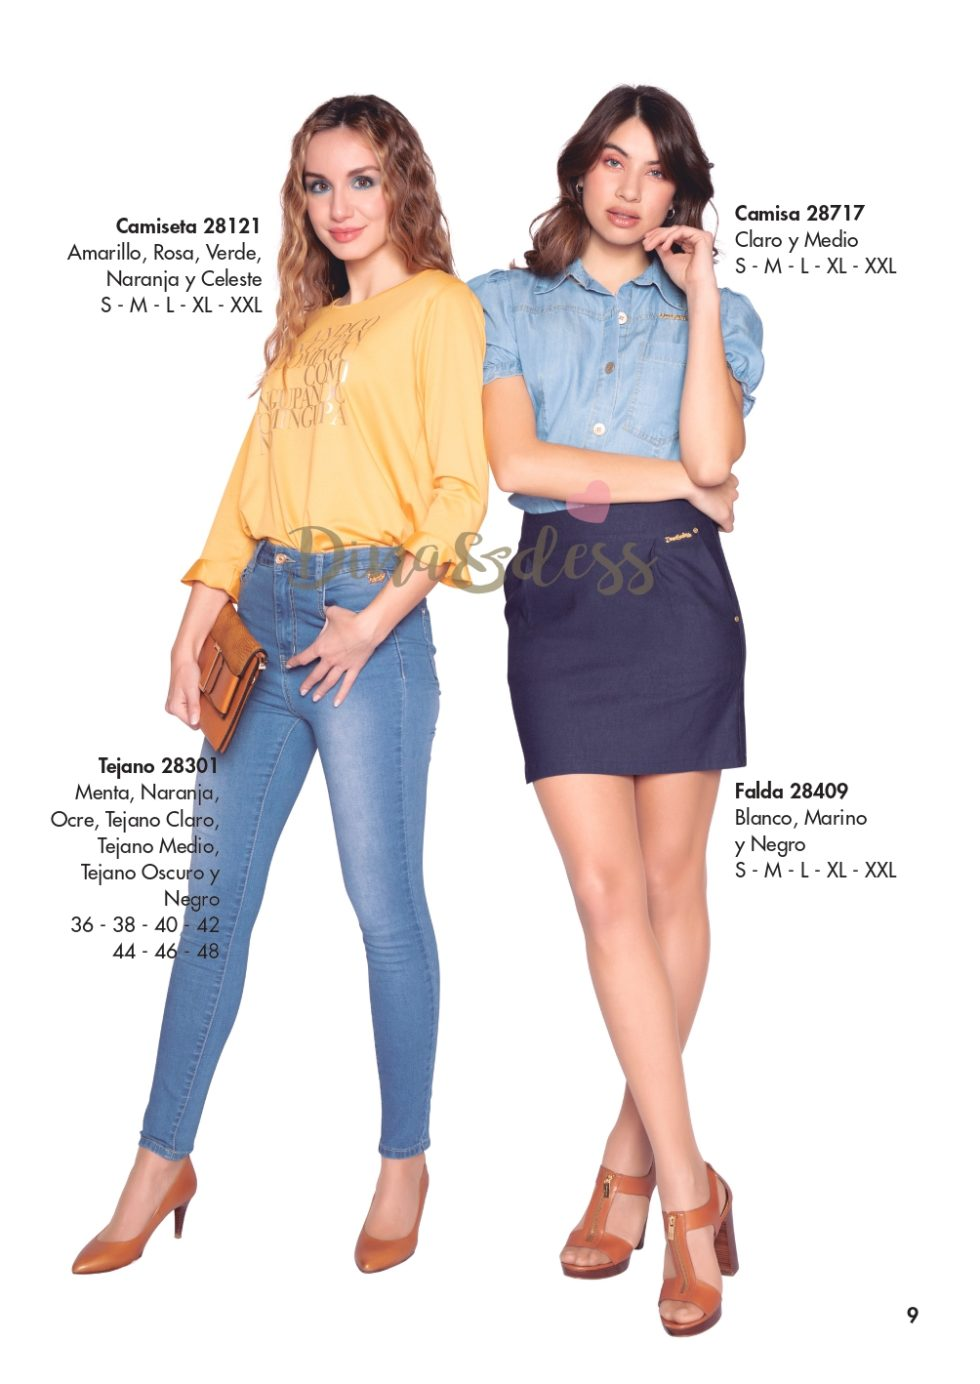 Verano 2021 Dina&Dess Clientes_page-0011